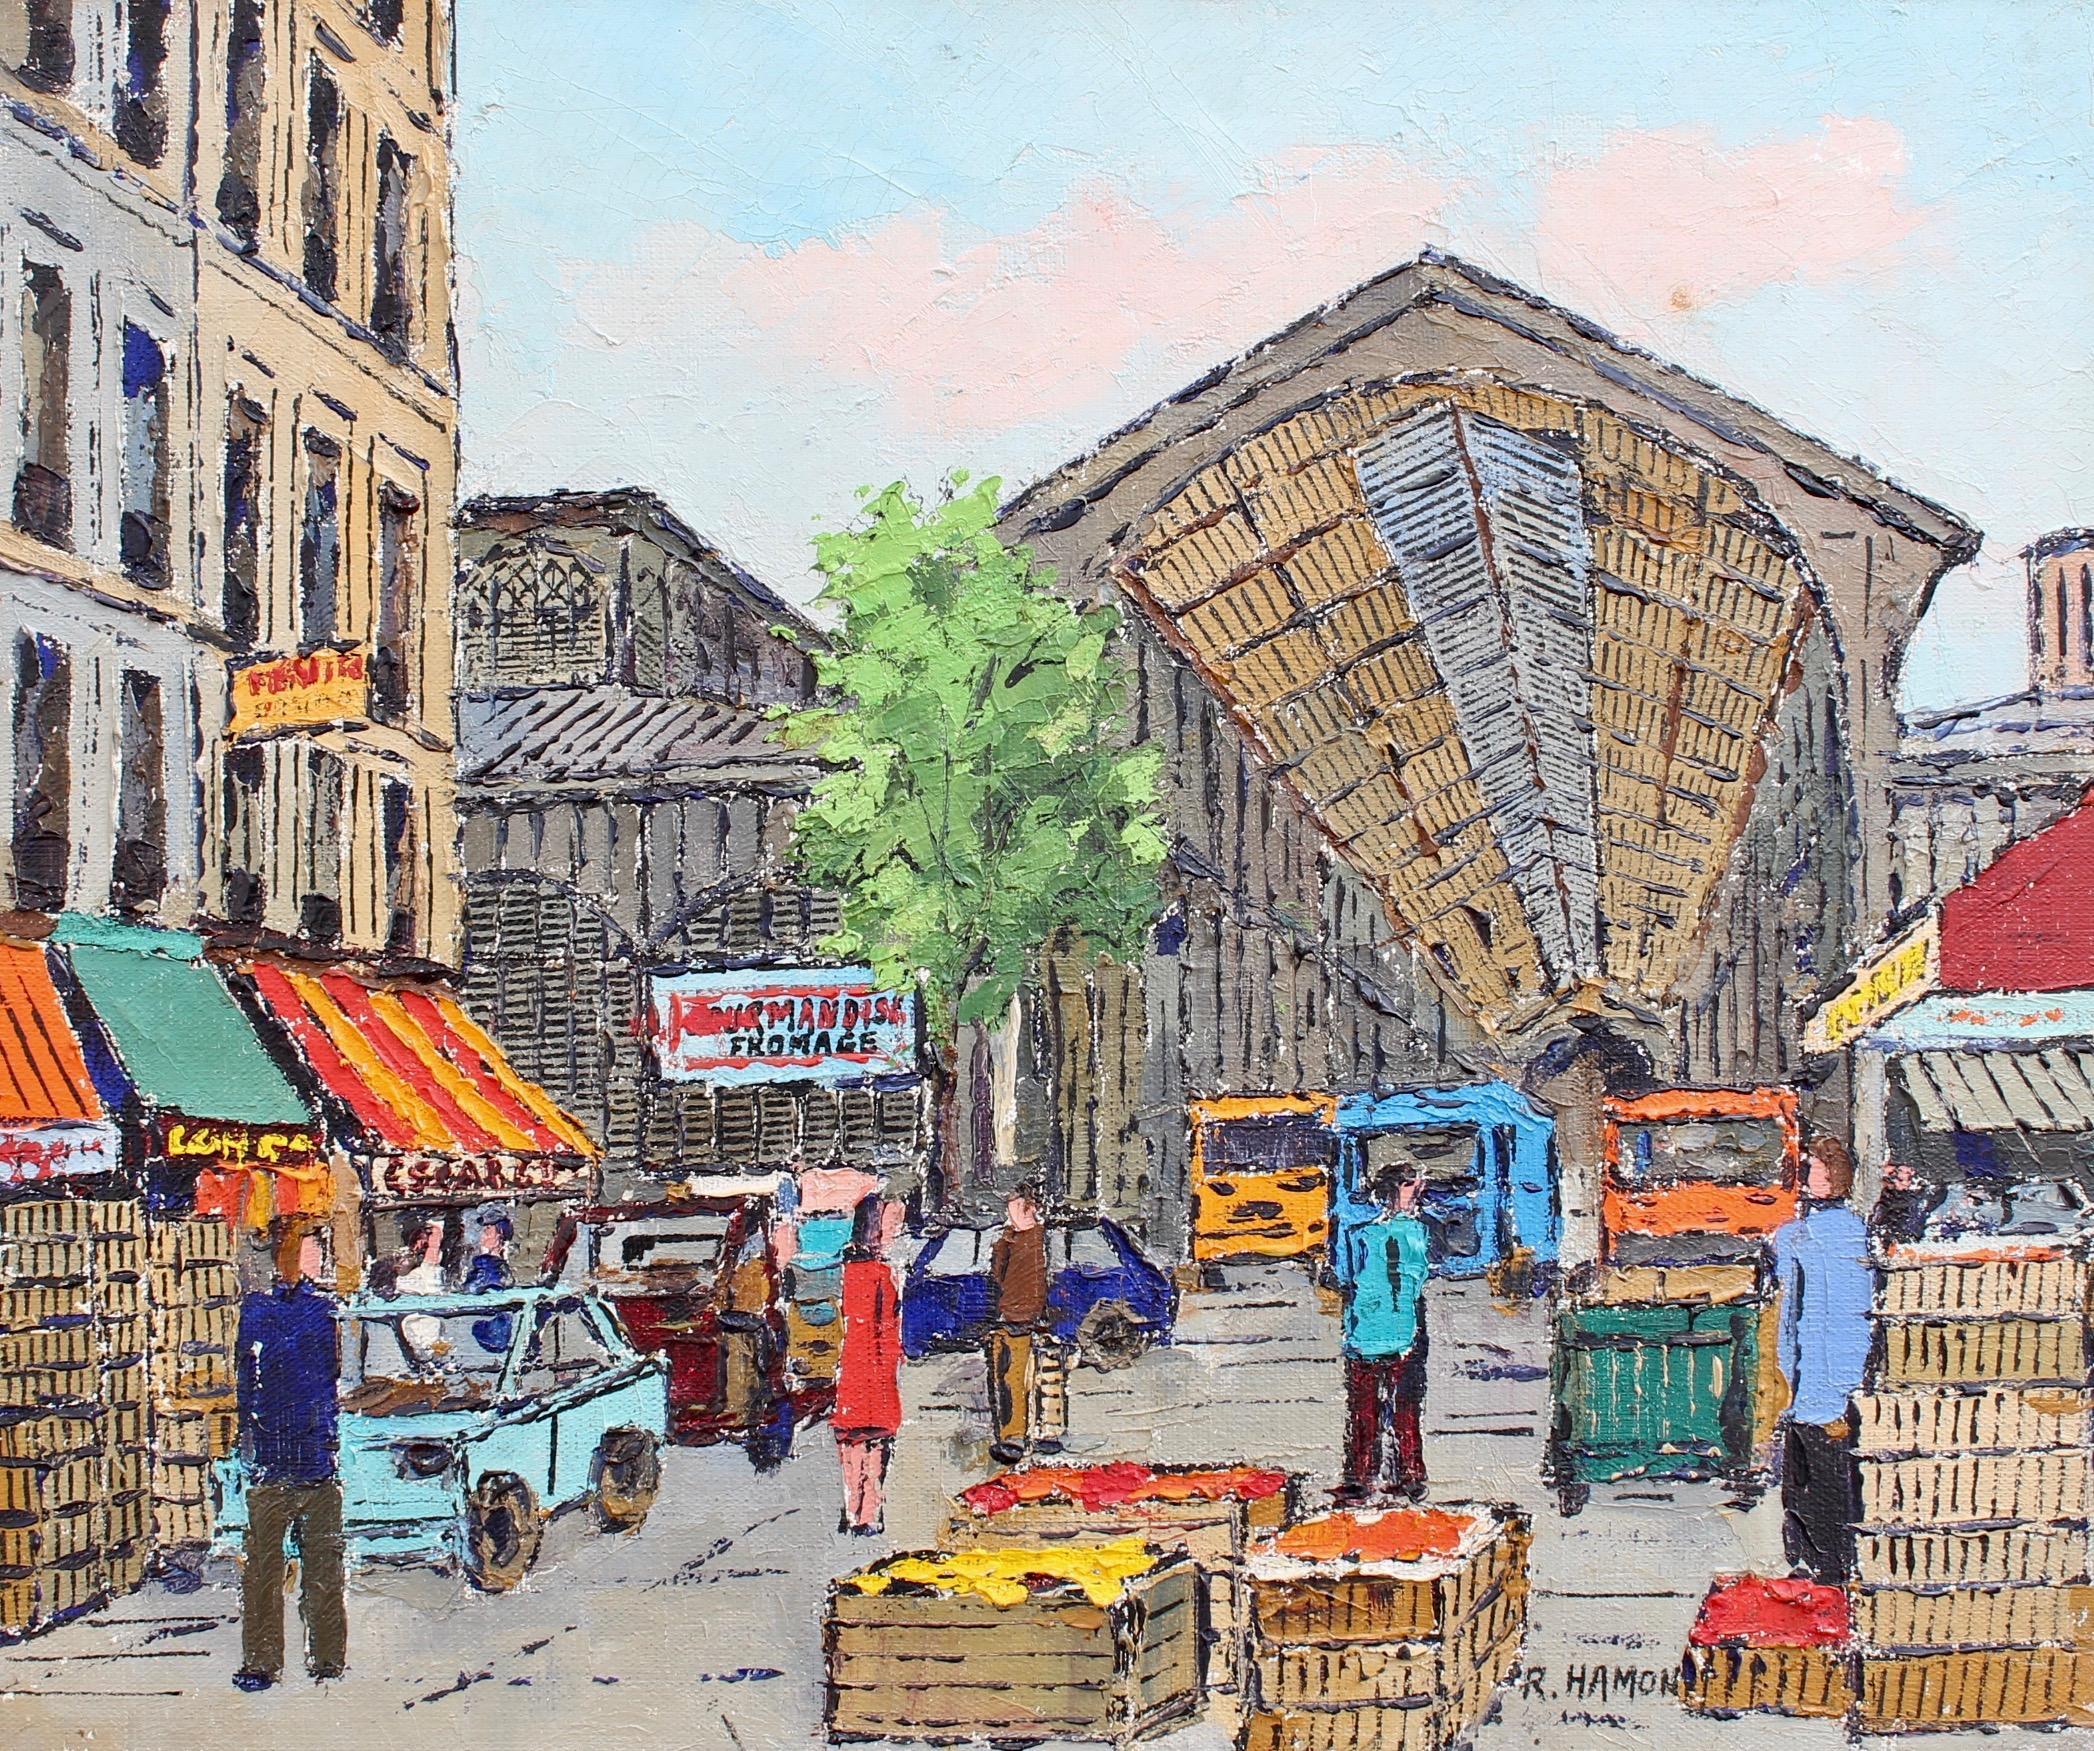 Les Halles Food Market